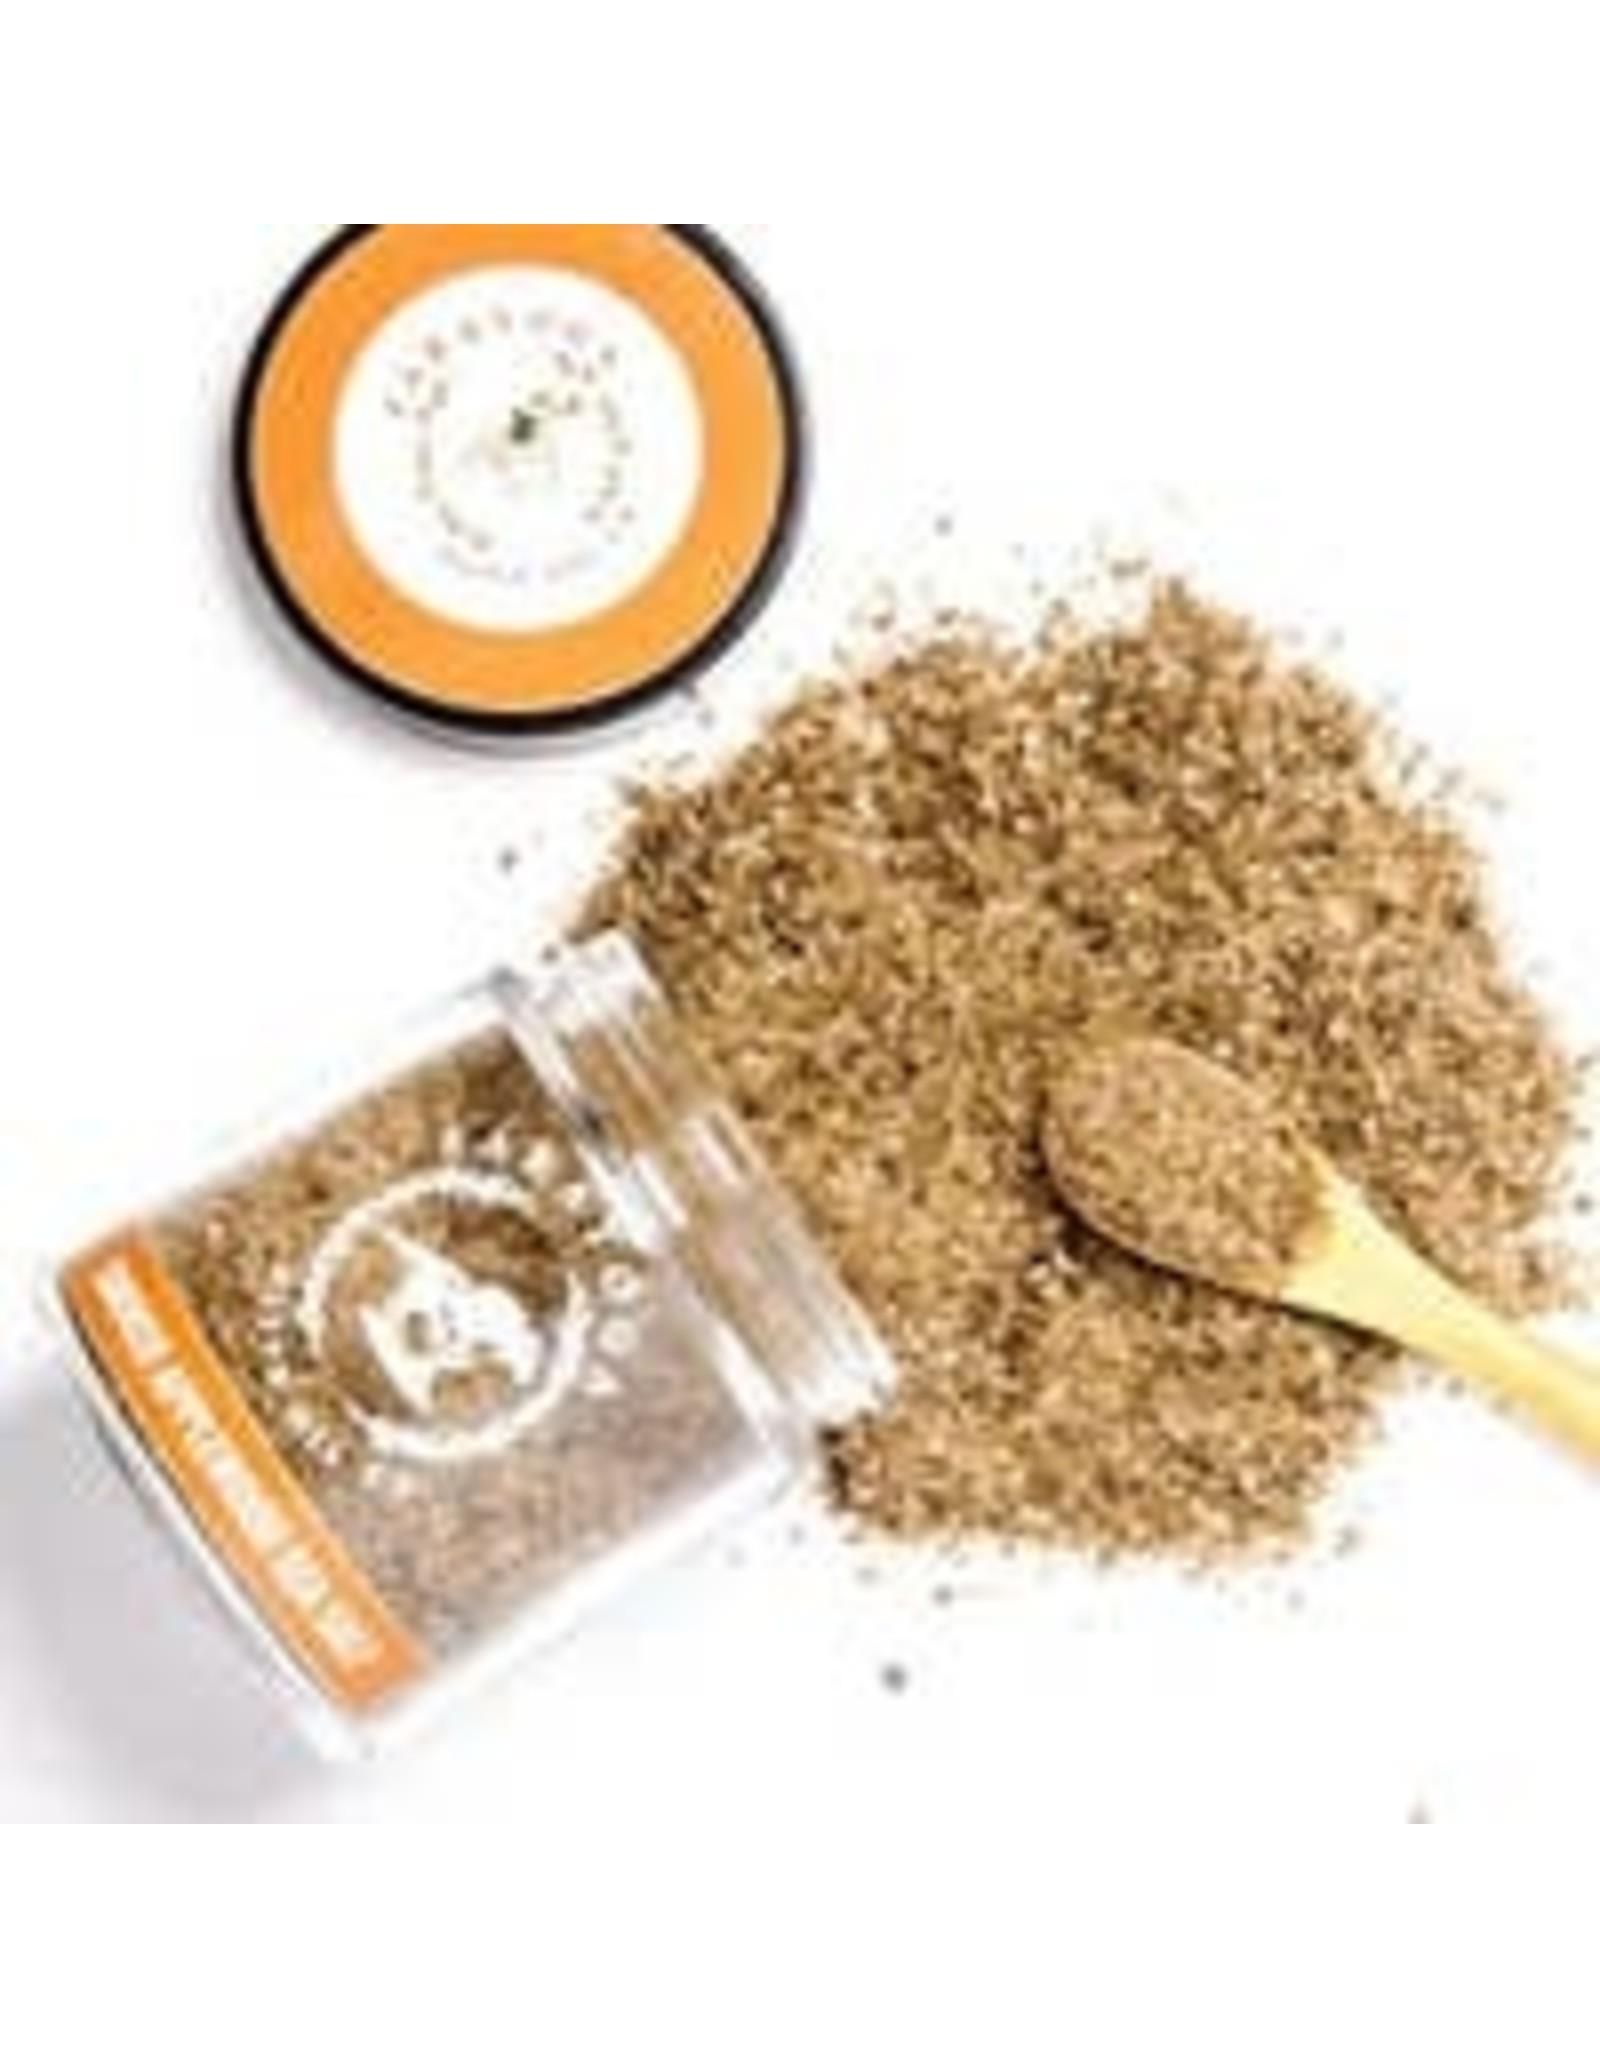 Saratoga Olive Oil Company Smoked Applewood Sea Salt